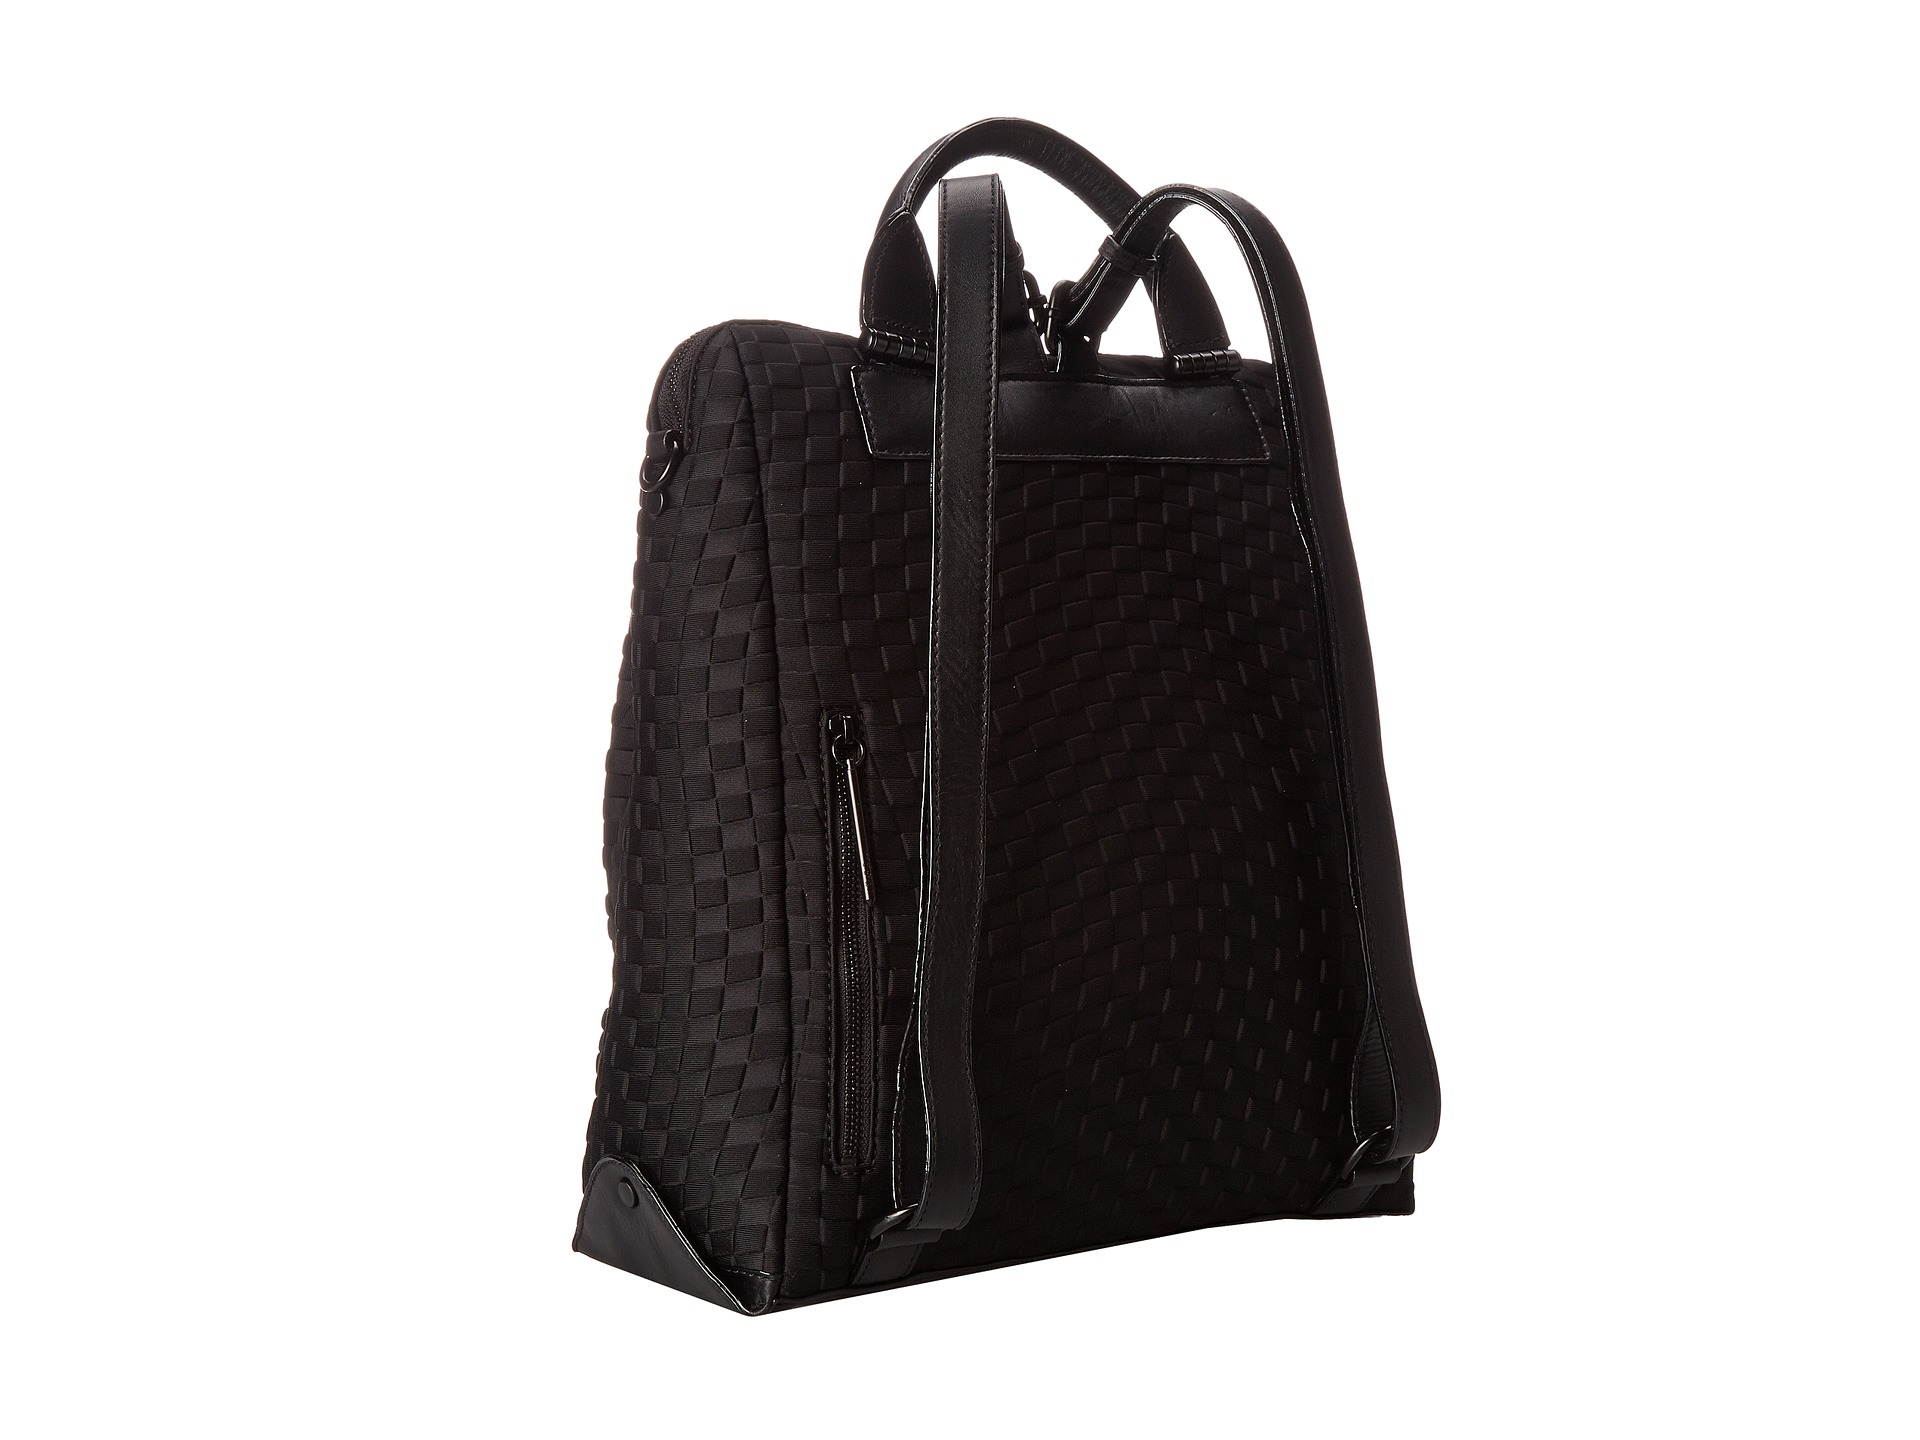 4e3899726143 Women's Black Olvera Metro Backpack